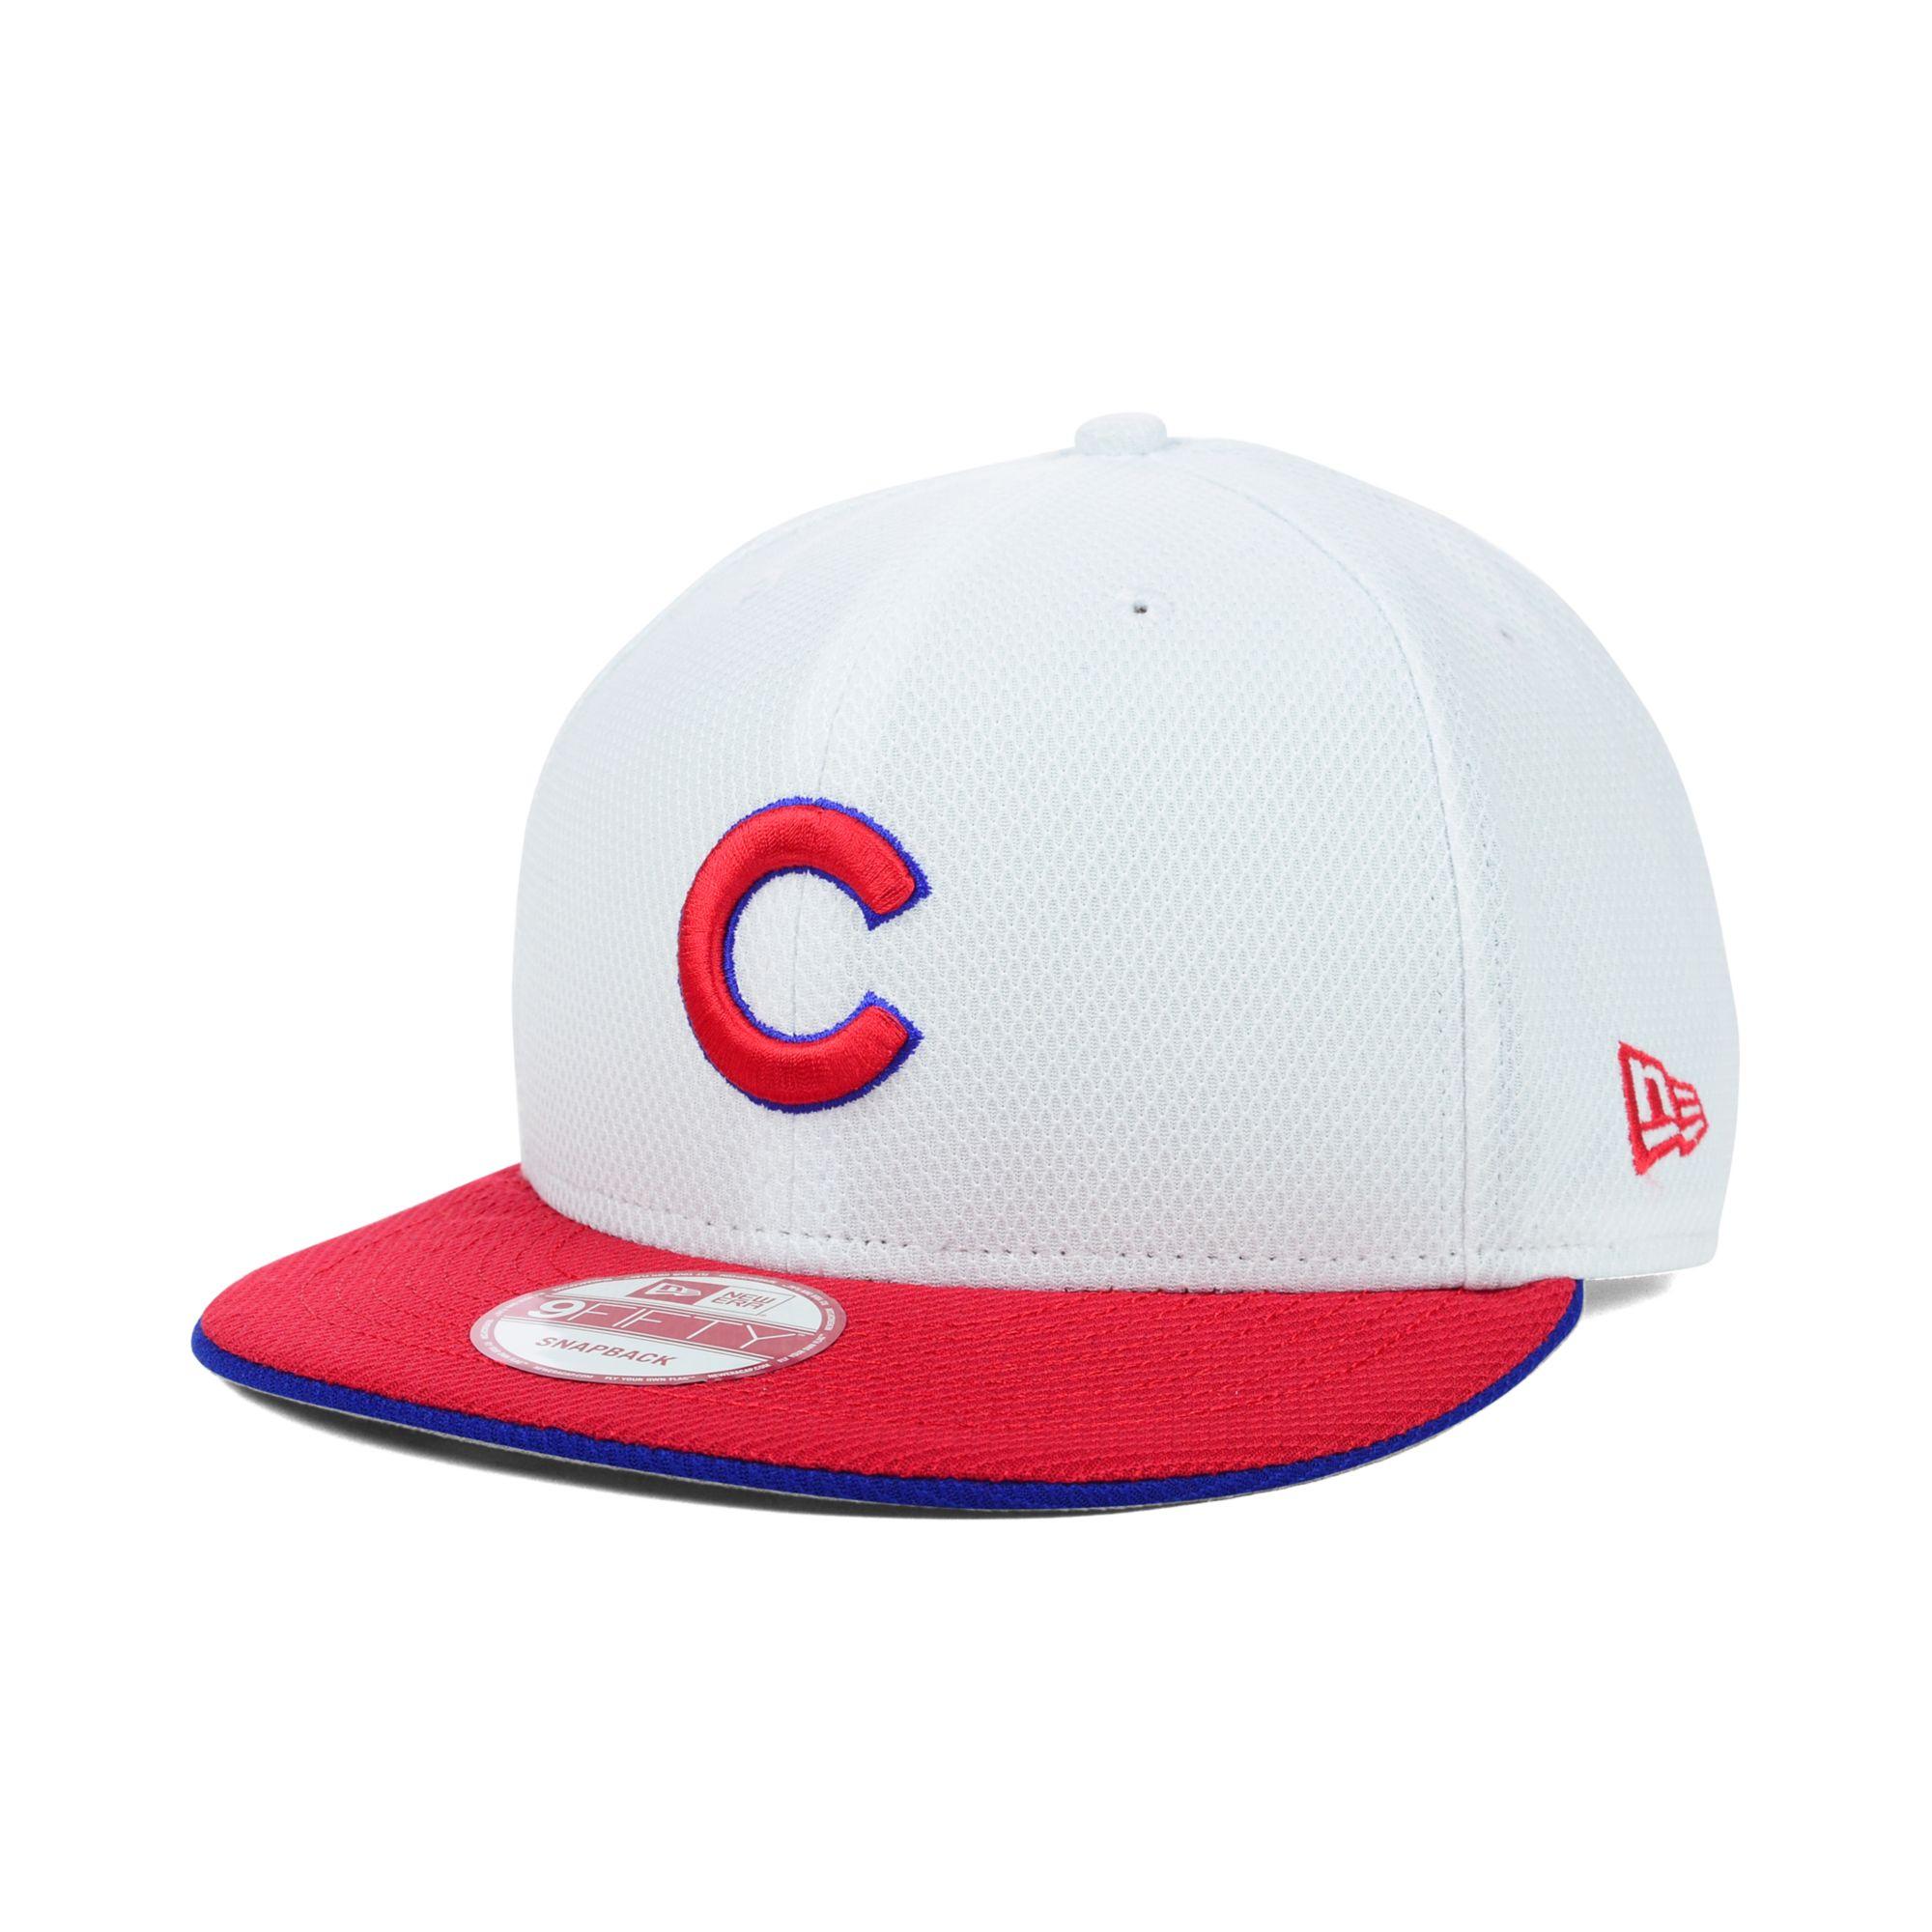 hot sale online 94e8b d6ff1 ... release date lyst ktz chicago cubs mlb white diamond era 9fifty  snapback cap in 3a605 62133